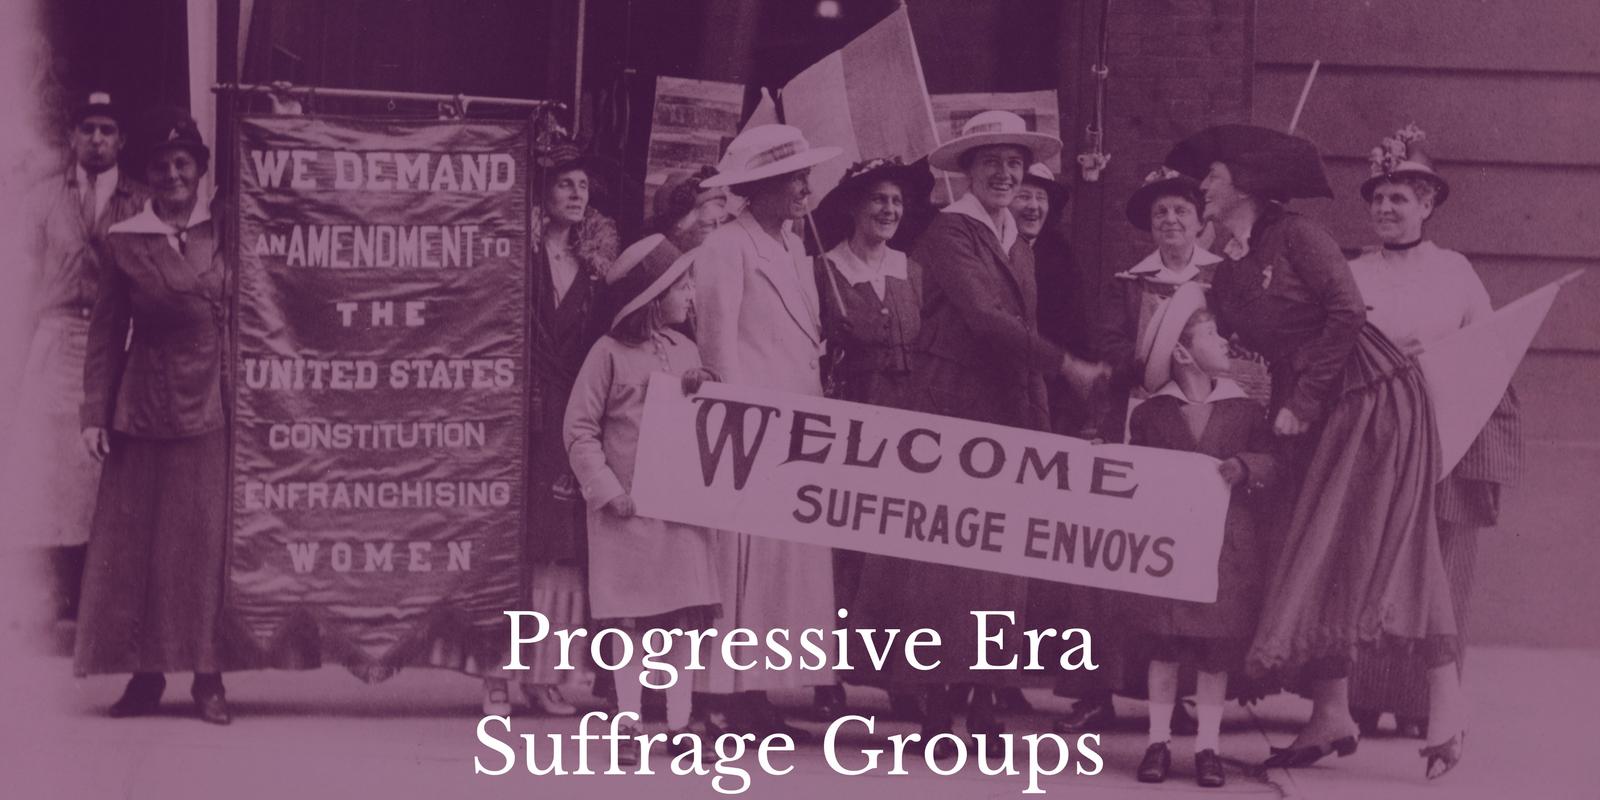 Progressive Era Suffrage Groups